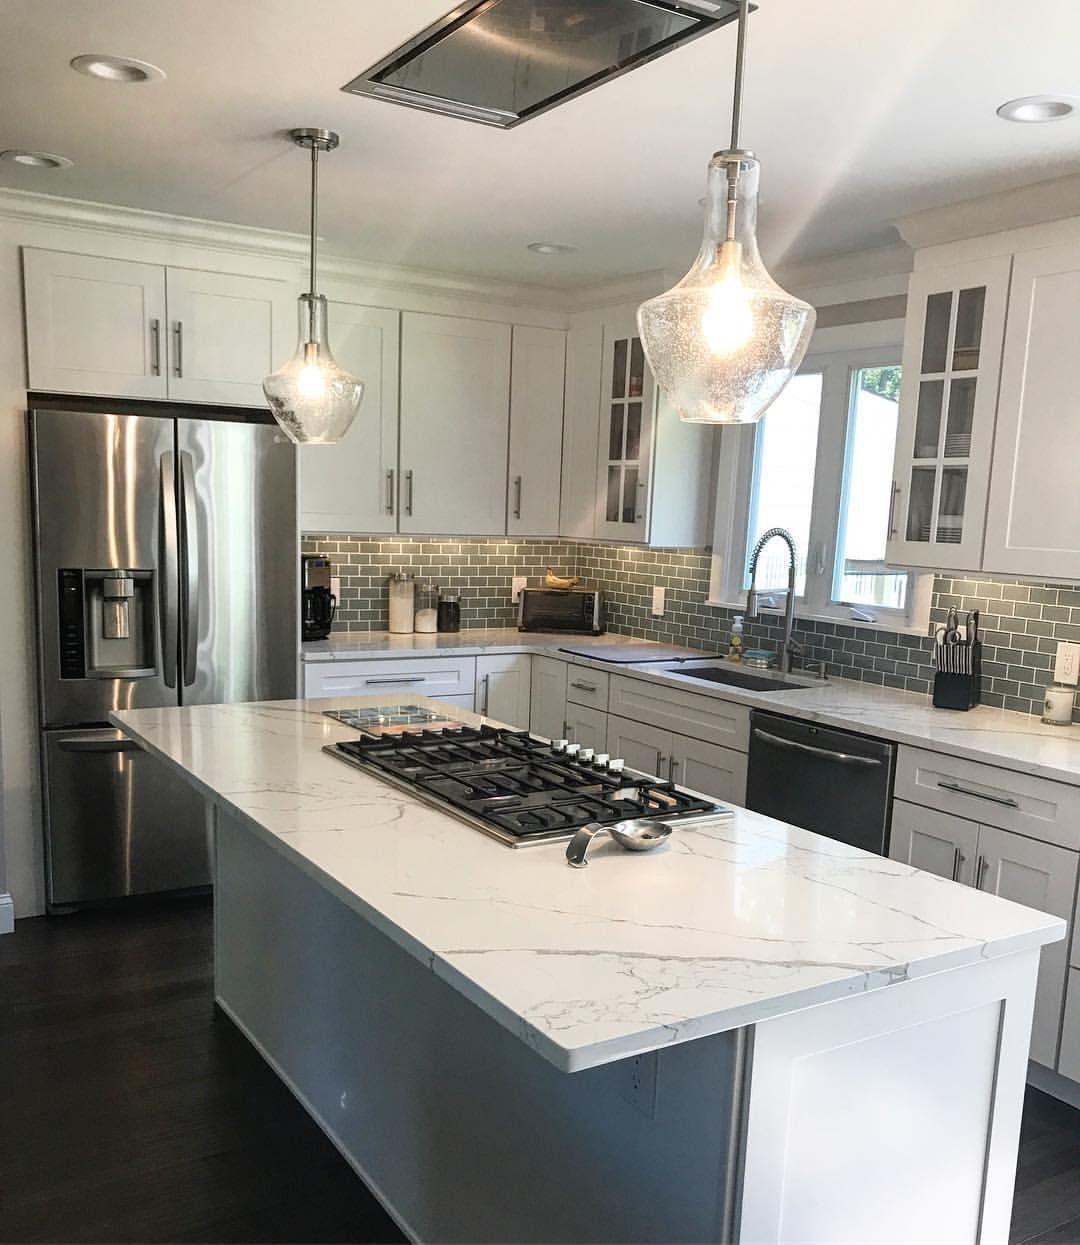 43 Amazing Master Kitchen that Inspire 2019 #kitchenremodel